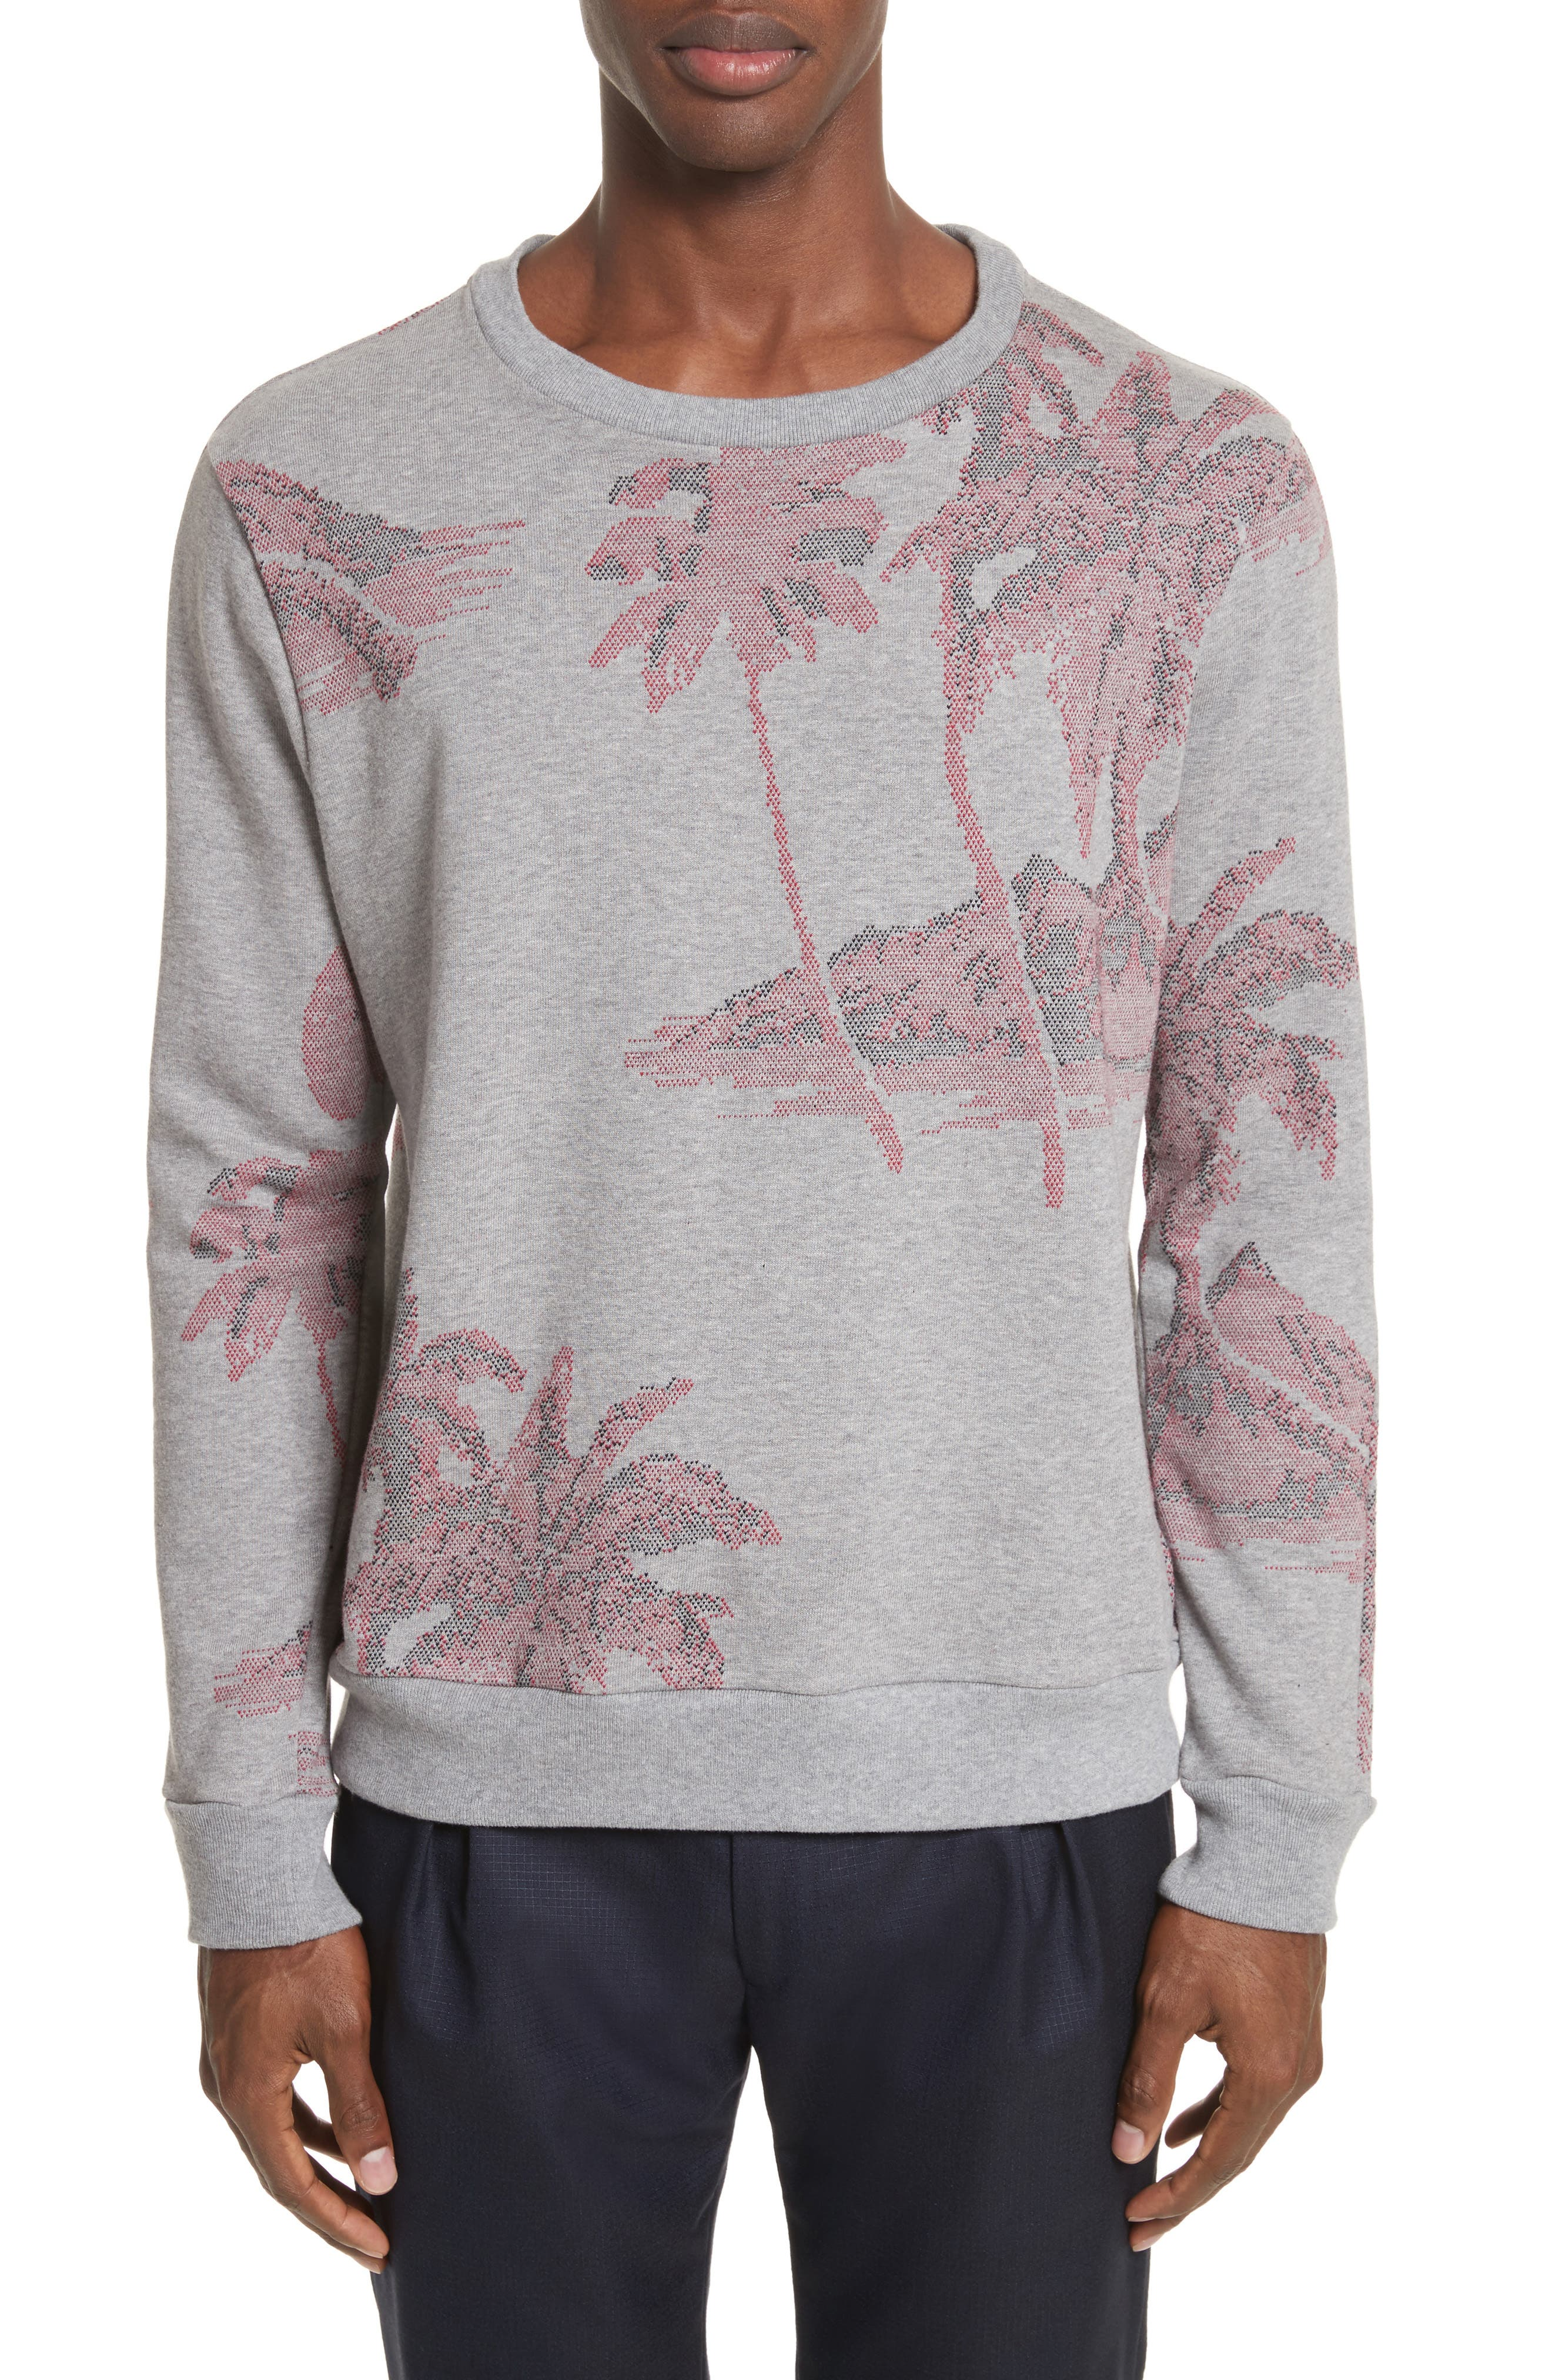 Crewneck Sweatshirt,                             Main thumbnail 1, color,                             24 Grey